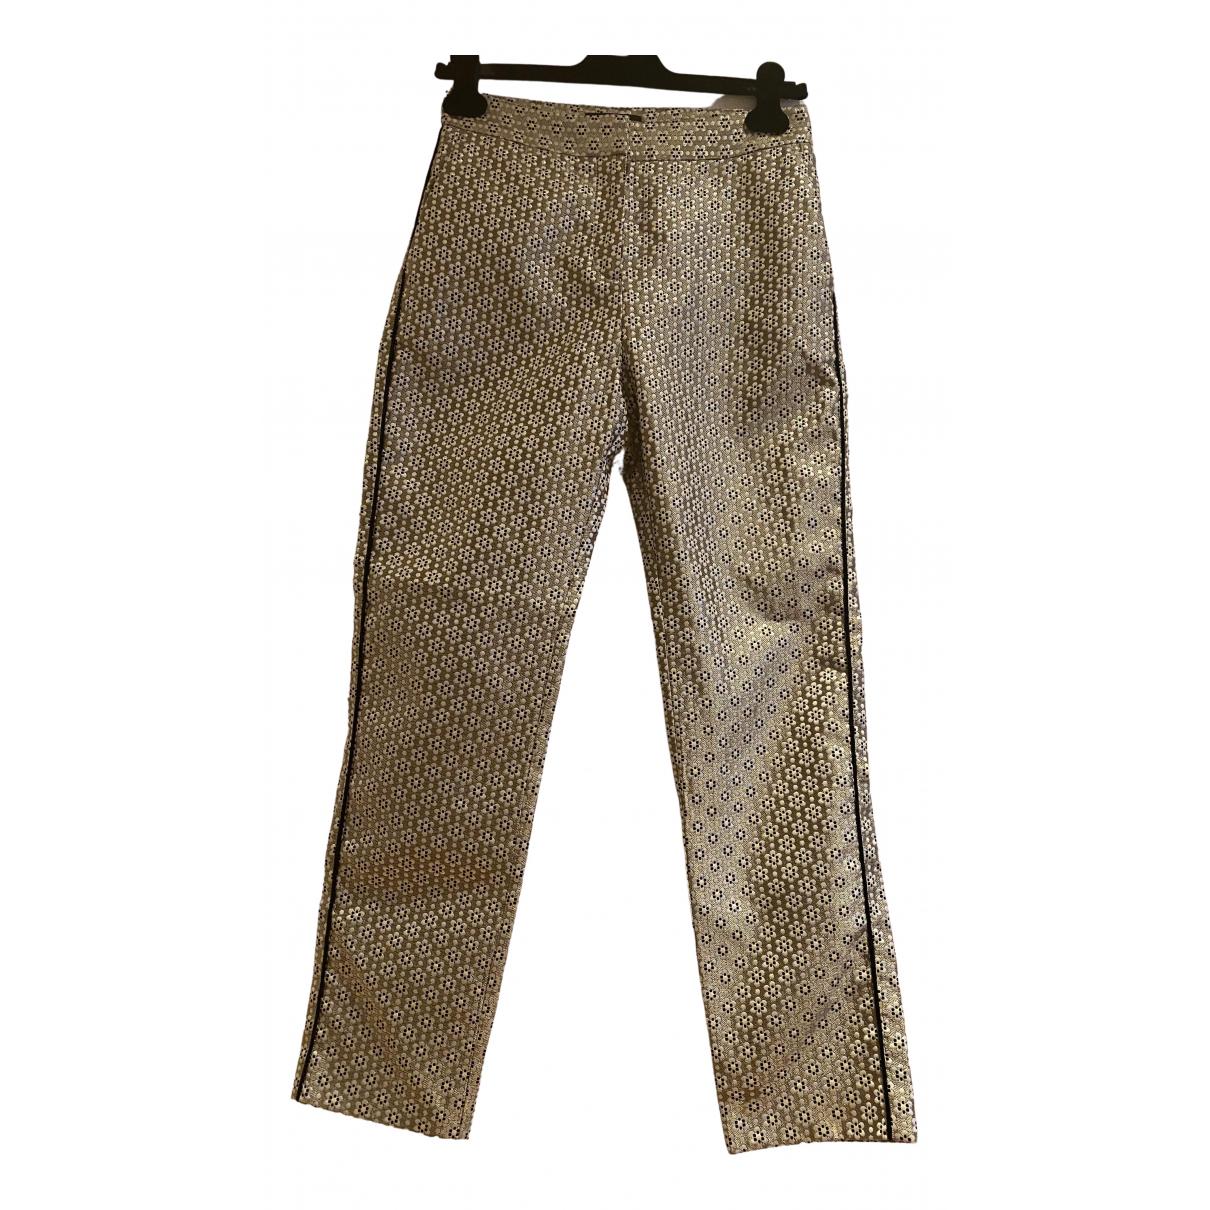 Maje Fall Winter 2019 Metallic Trousers for Women 36 FR